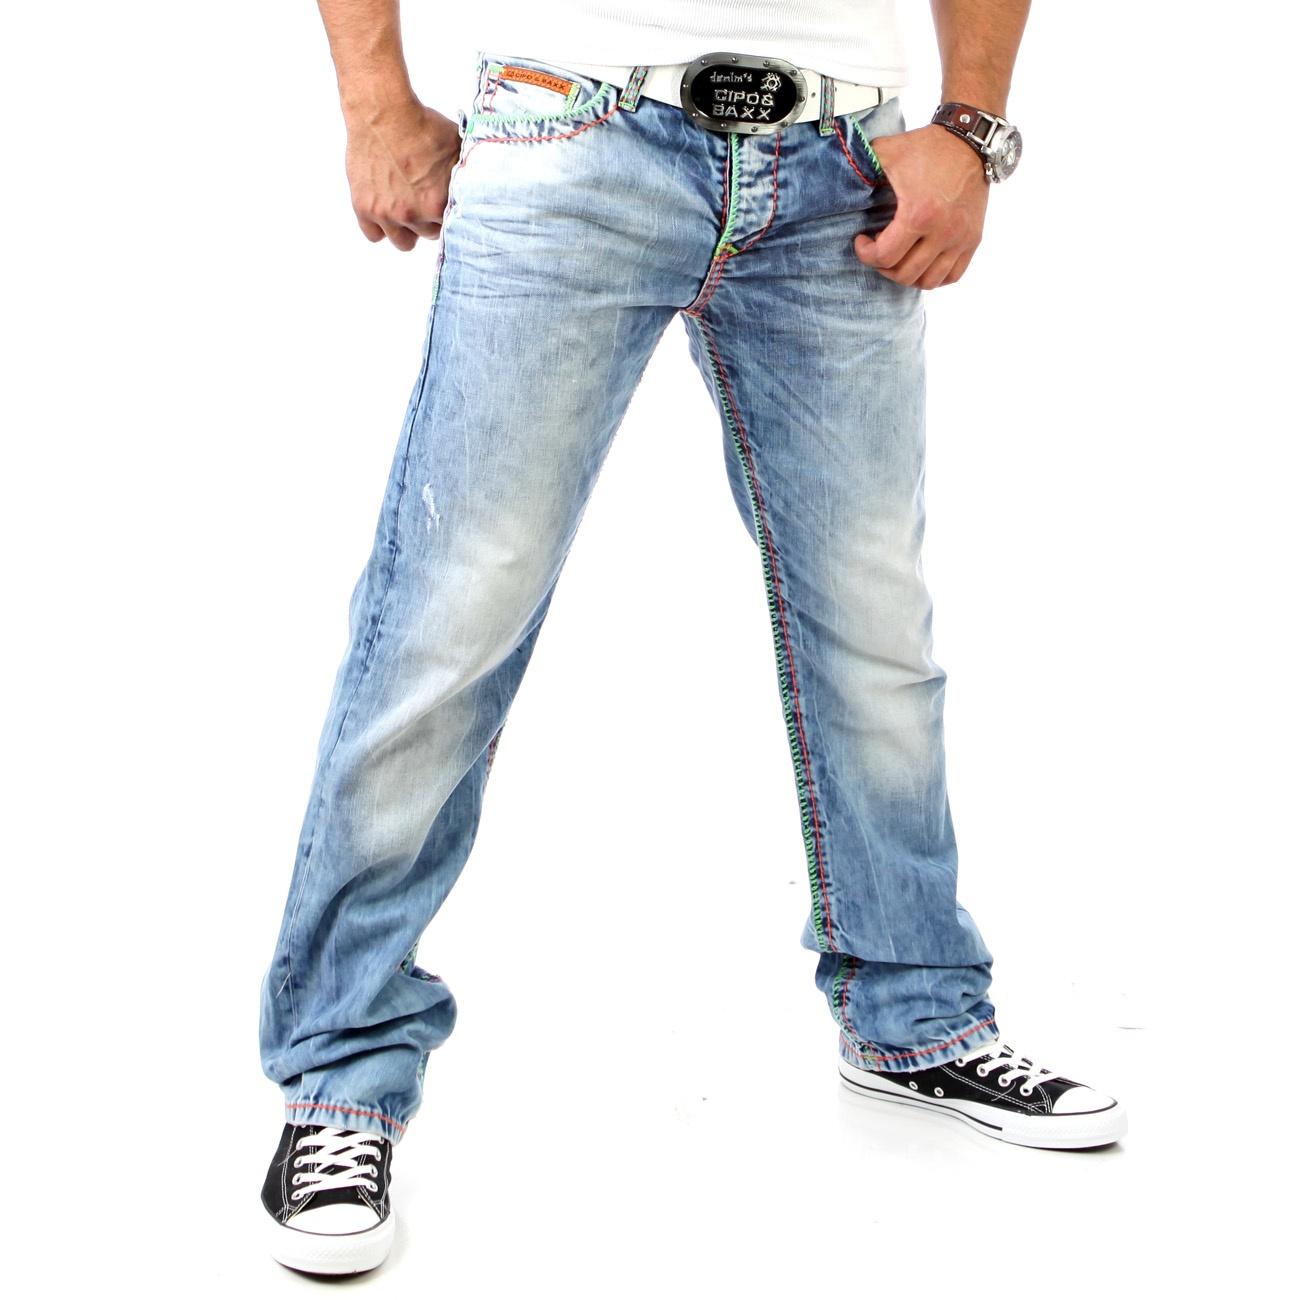 cipo baxx original denim herren jeanshose jeans hose neon naht c 925 h blau ebay. Black Bedroom Furniture Sets. Home Design Ideas